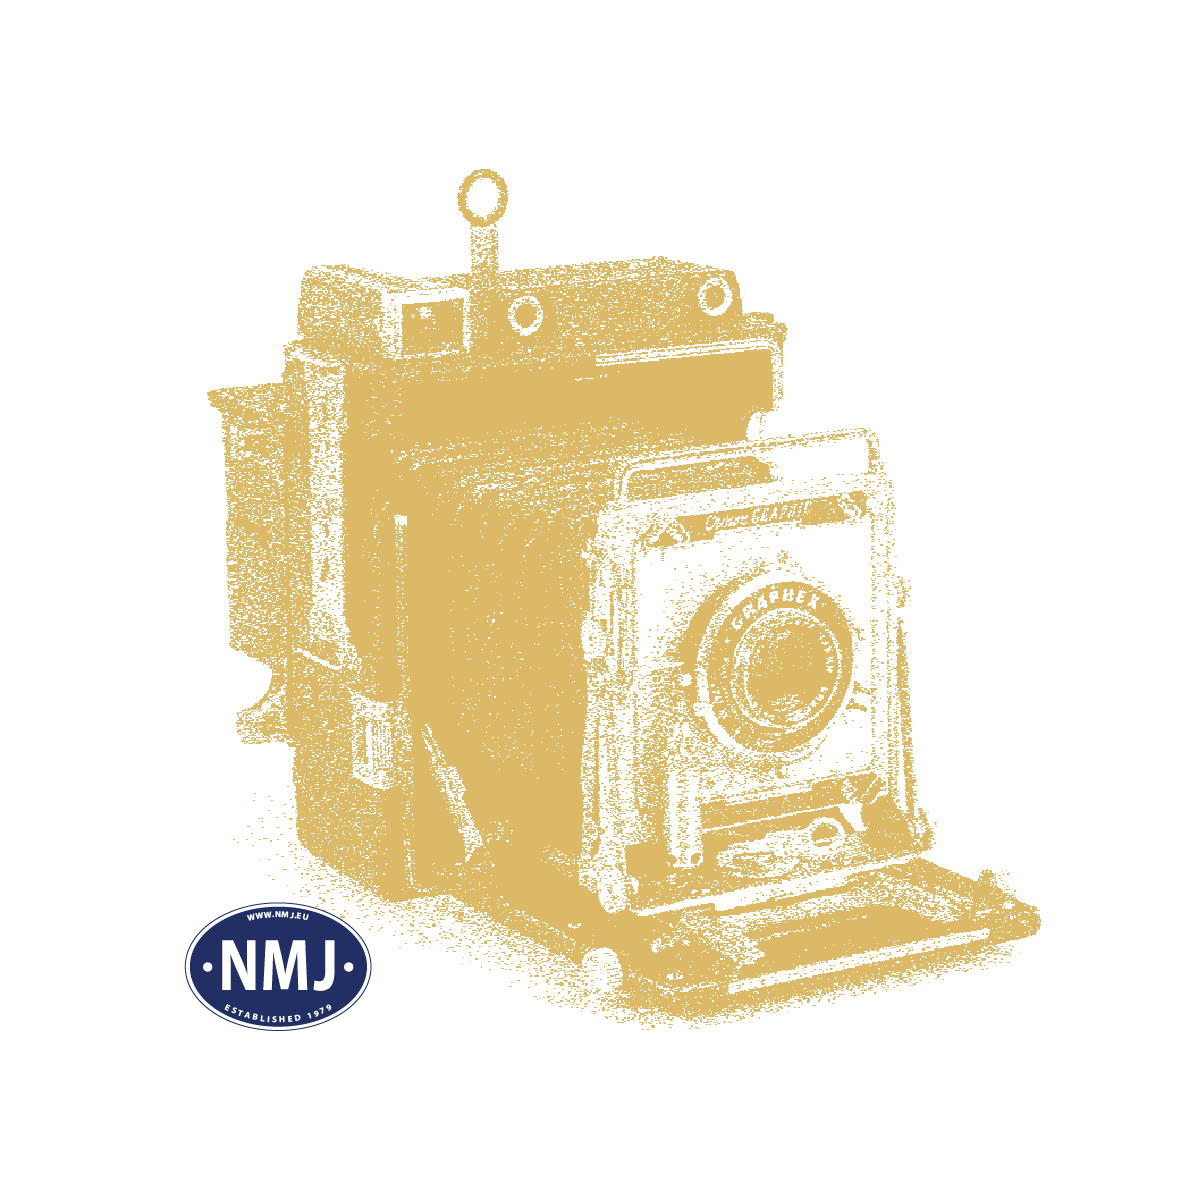 NOC07133 - Gresstuster, 104 Stk